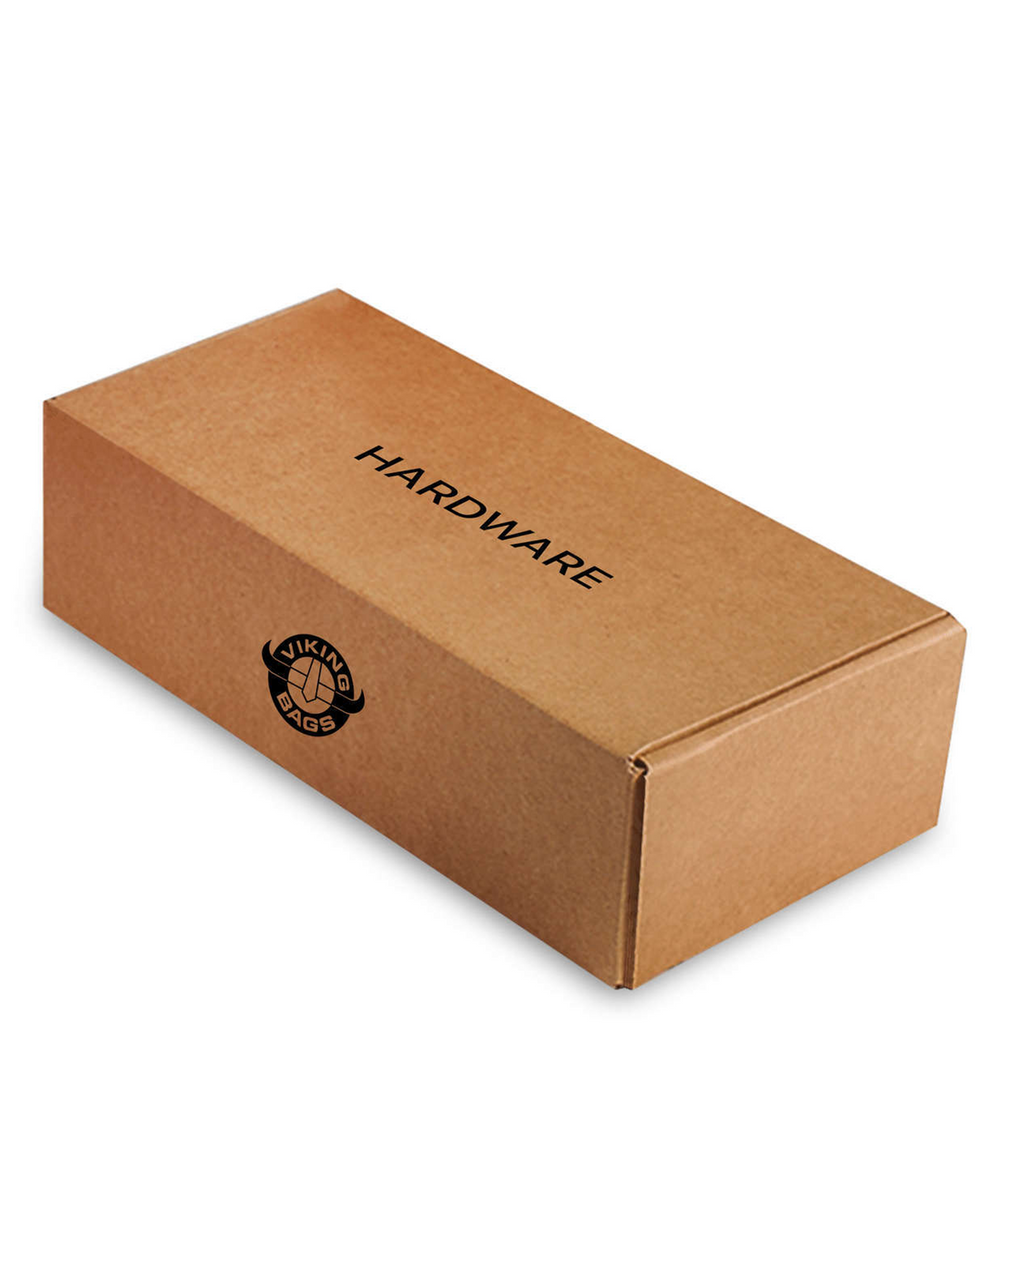 Honda Magna 750 Charger Side Pocket With Shock Cutout Motorcycle Saddlebags Hardware box